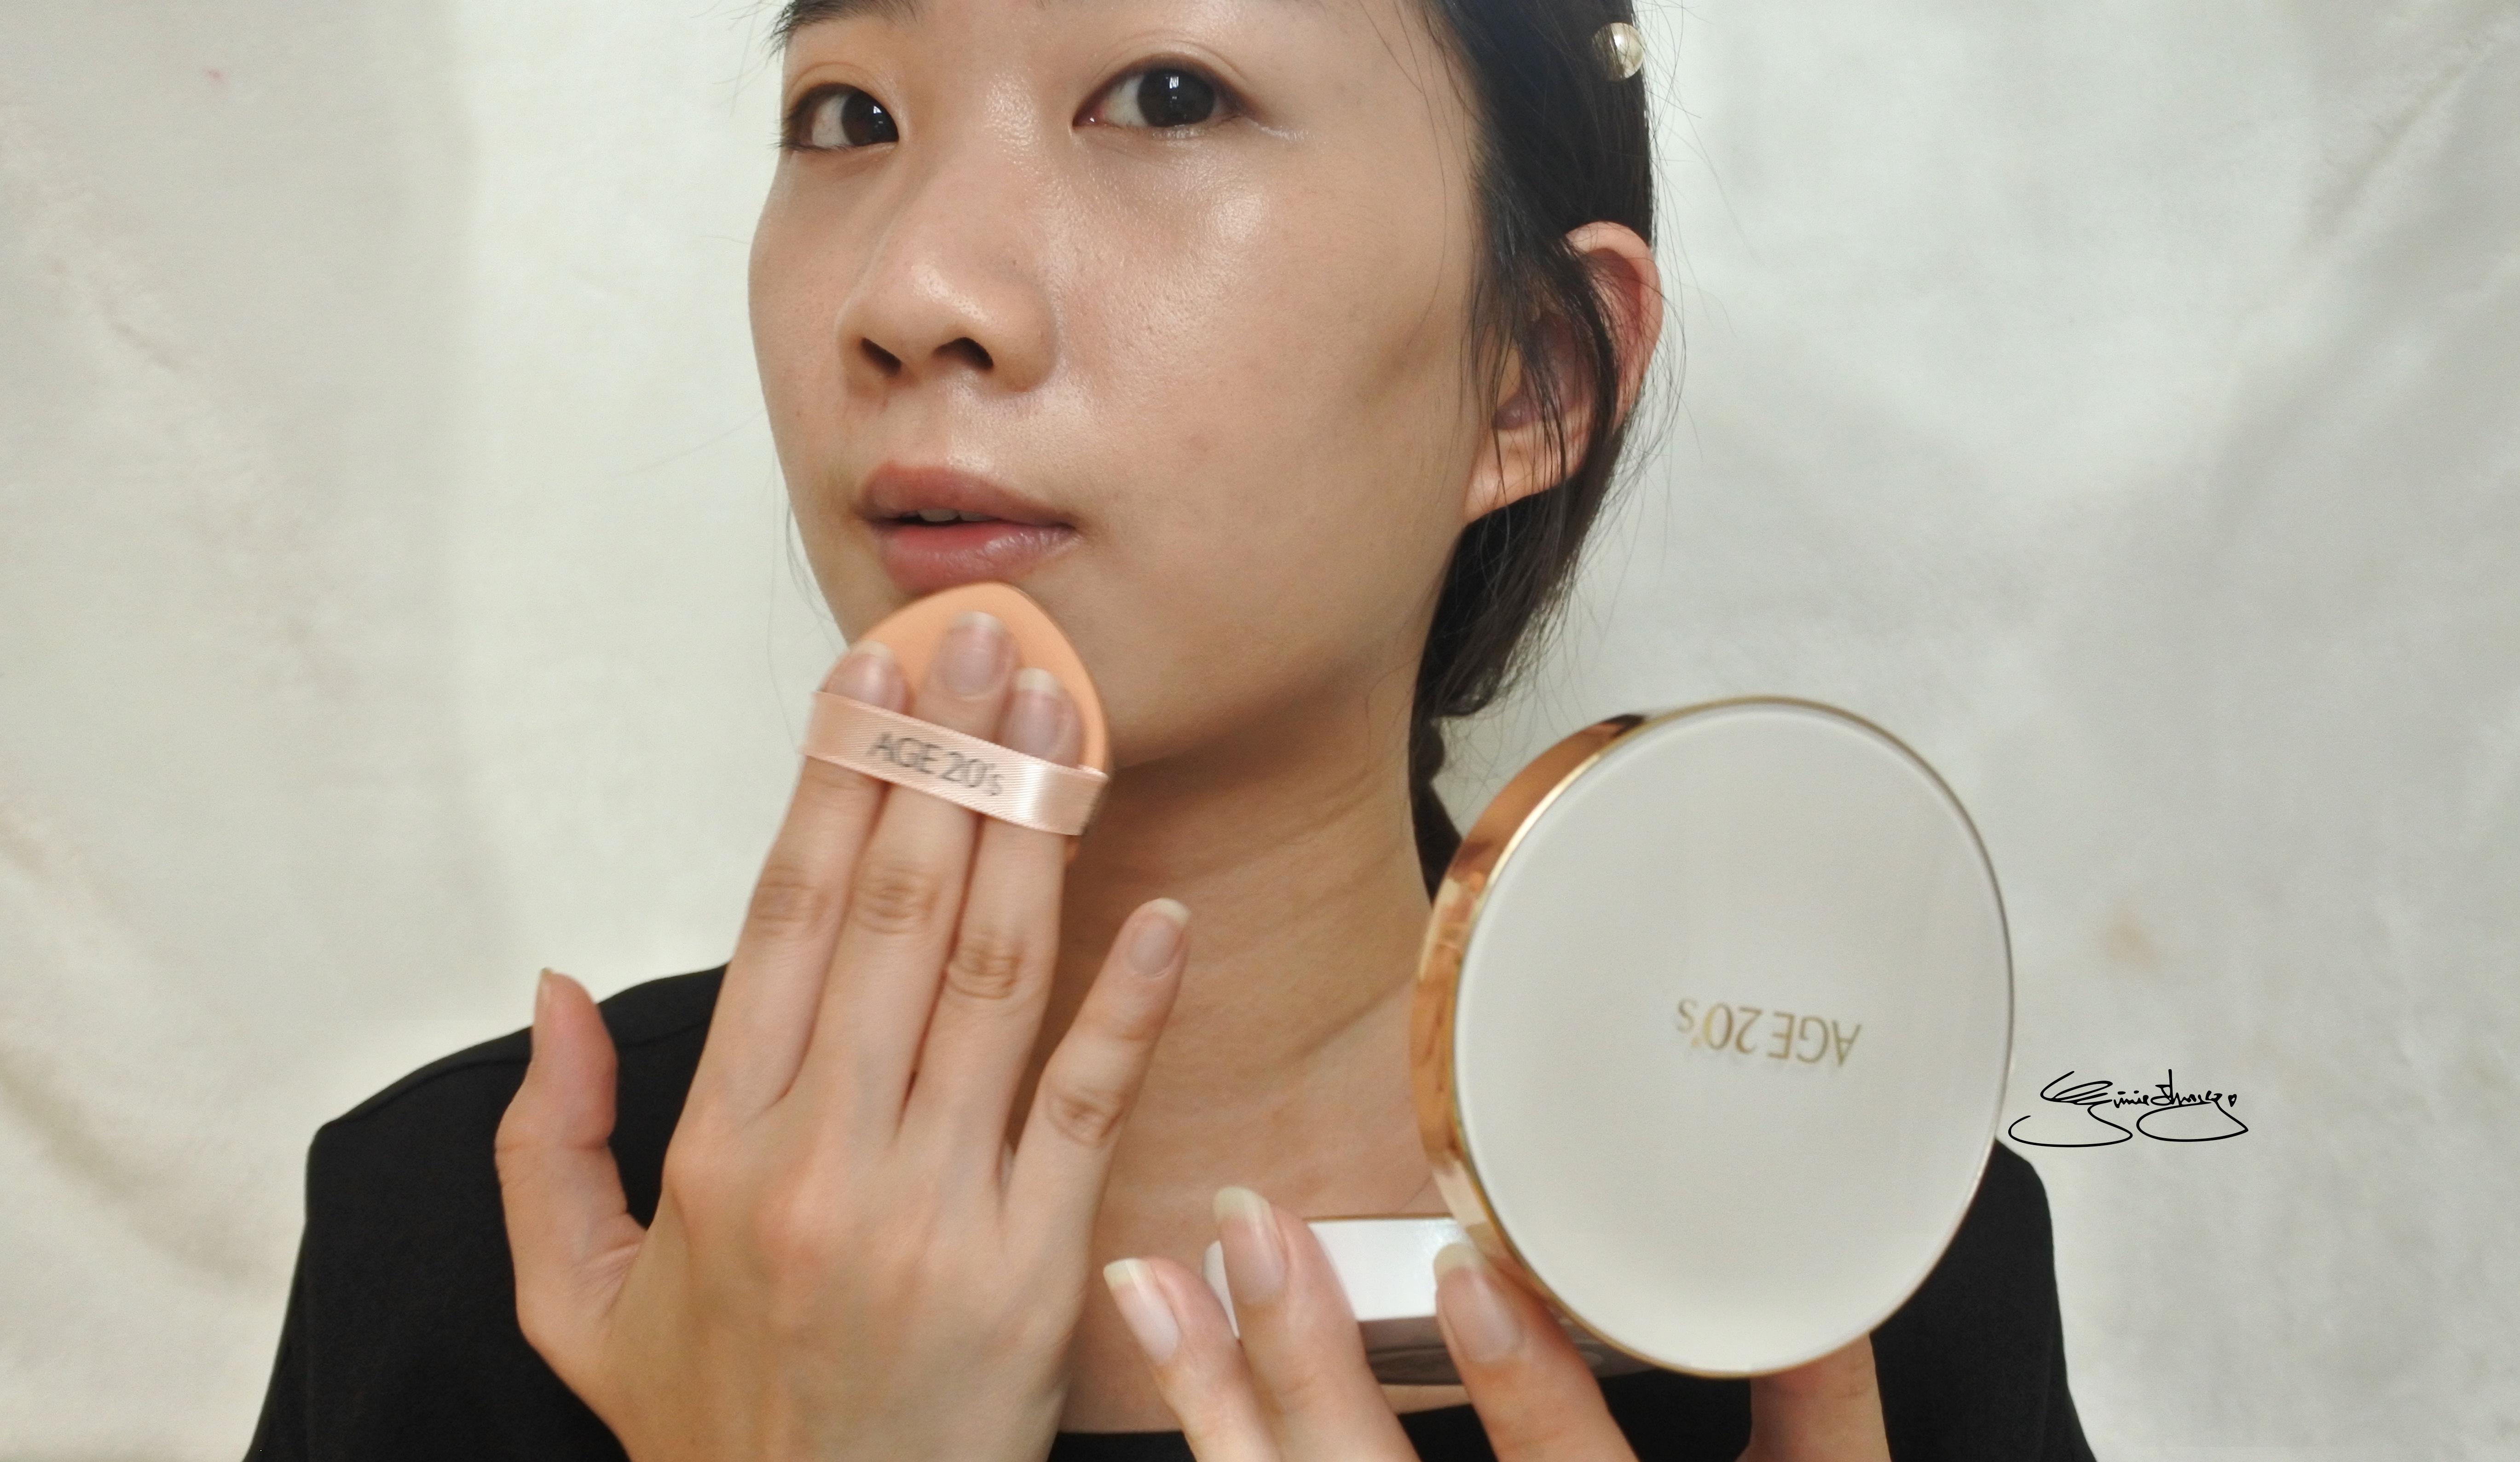 AGE20%5Cs 瓷透肌聚焦爆水粉餅 使用